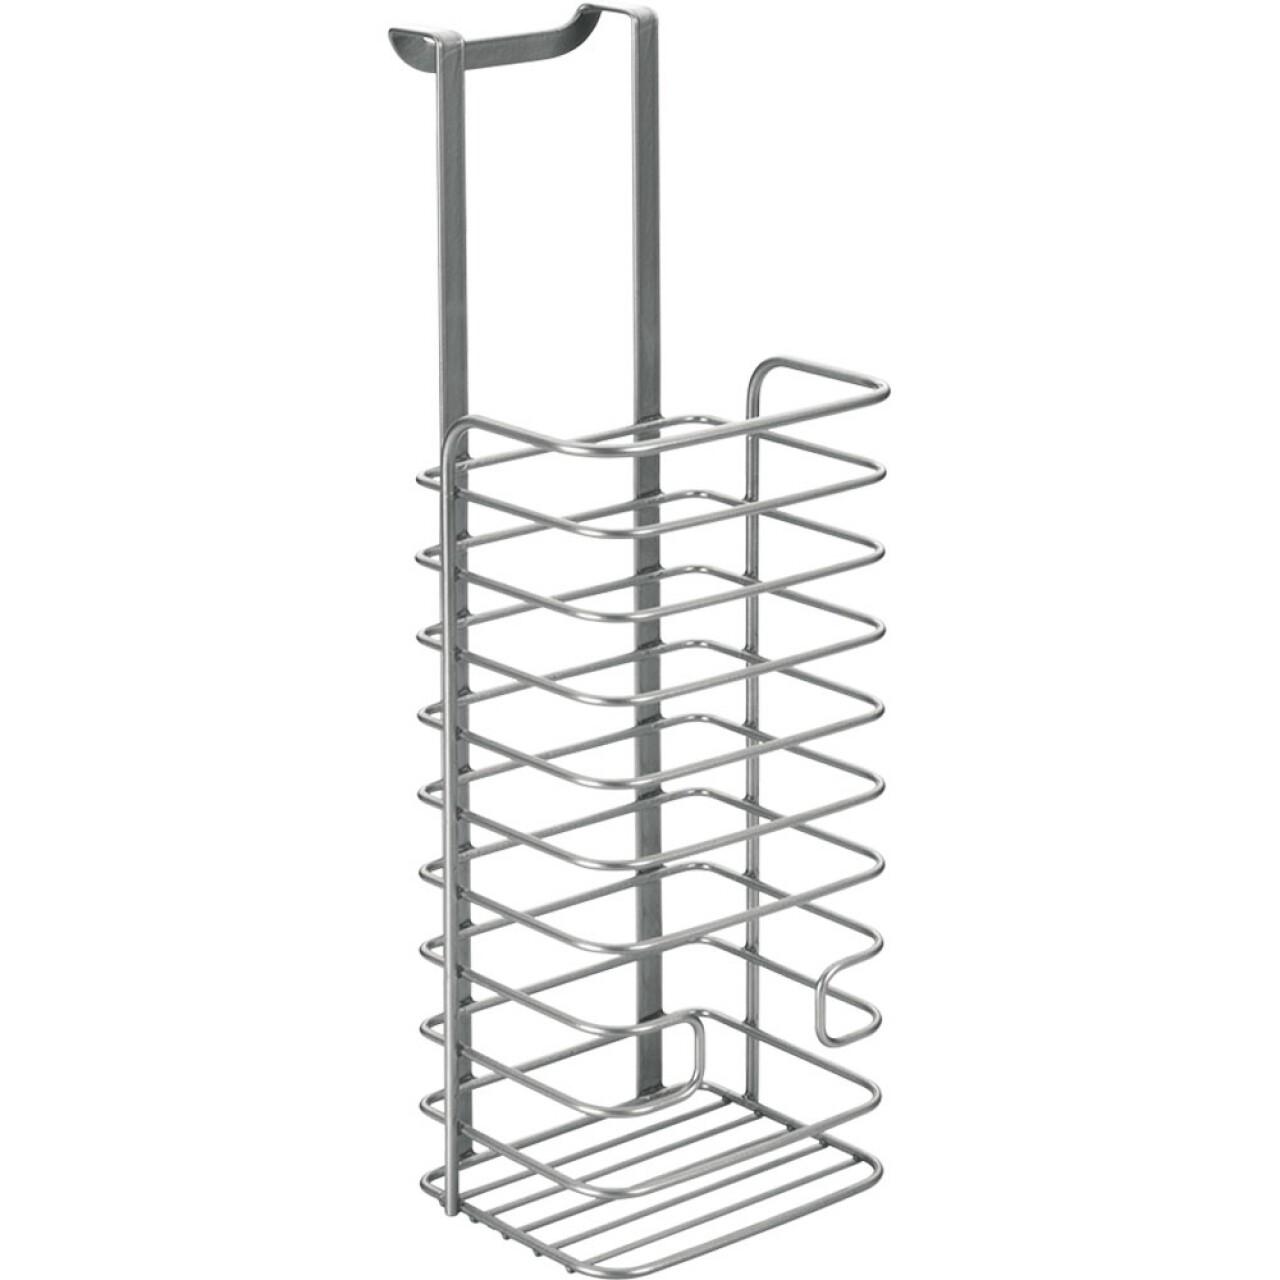 Suport pentru pungi Galileo Metaltex, 12x12x36 cm, metal/invelis Polytherm, argintiu